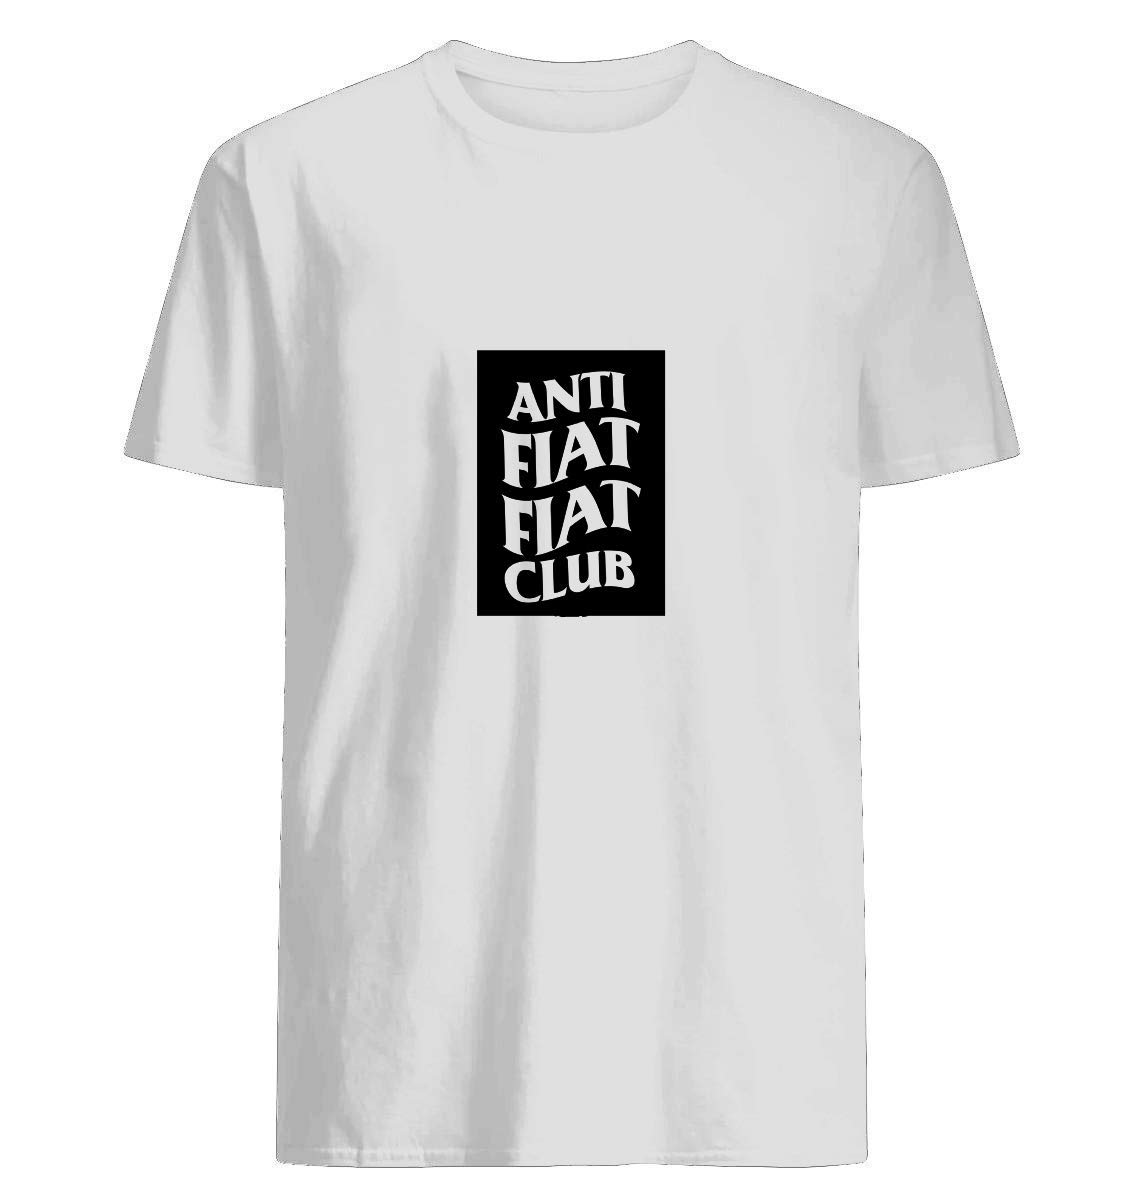 Anti Fiat Fiat Club 43 T Shirt For Unisex